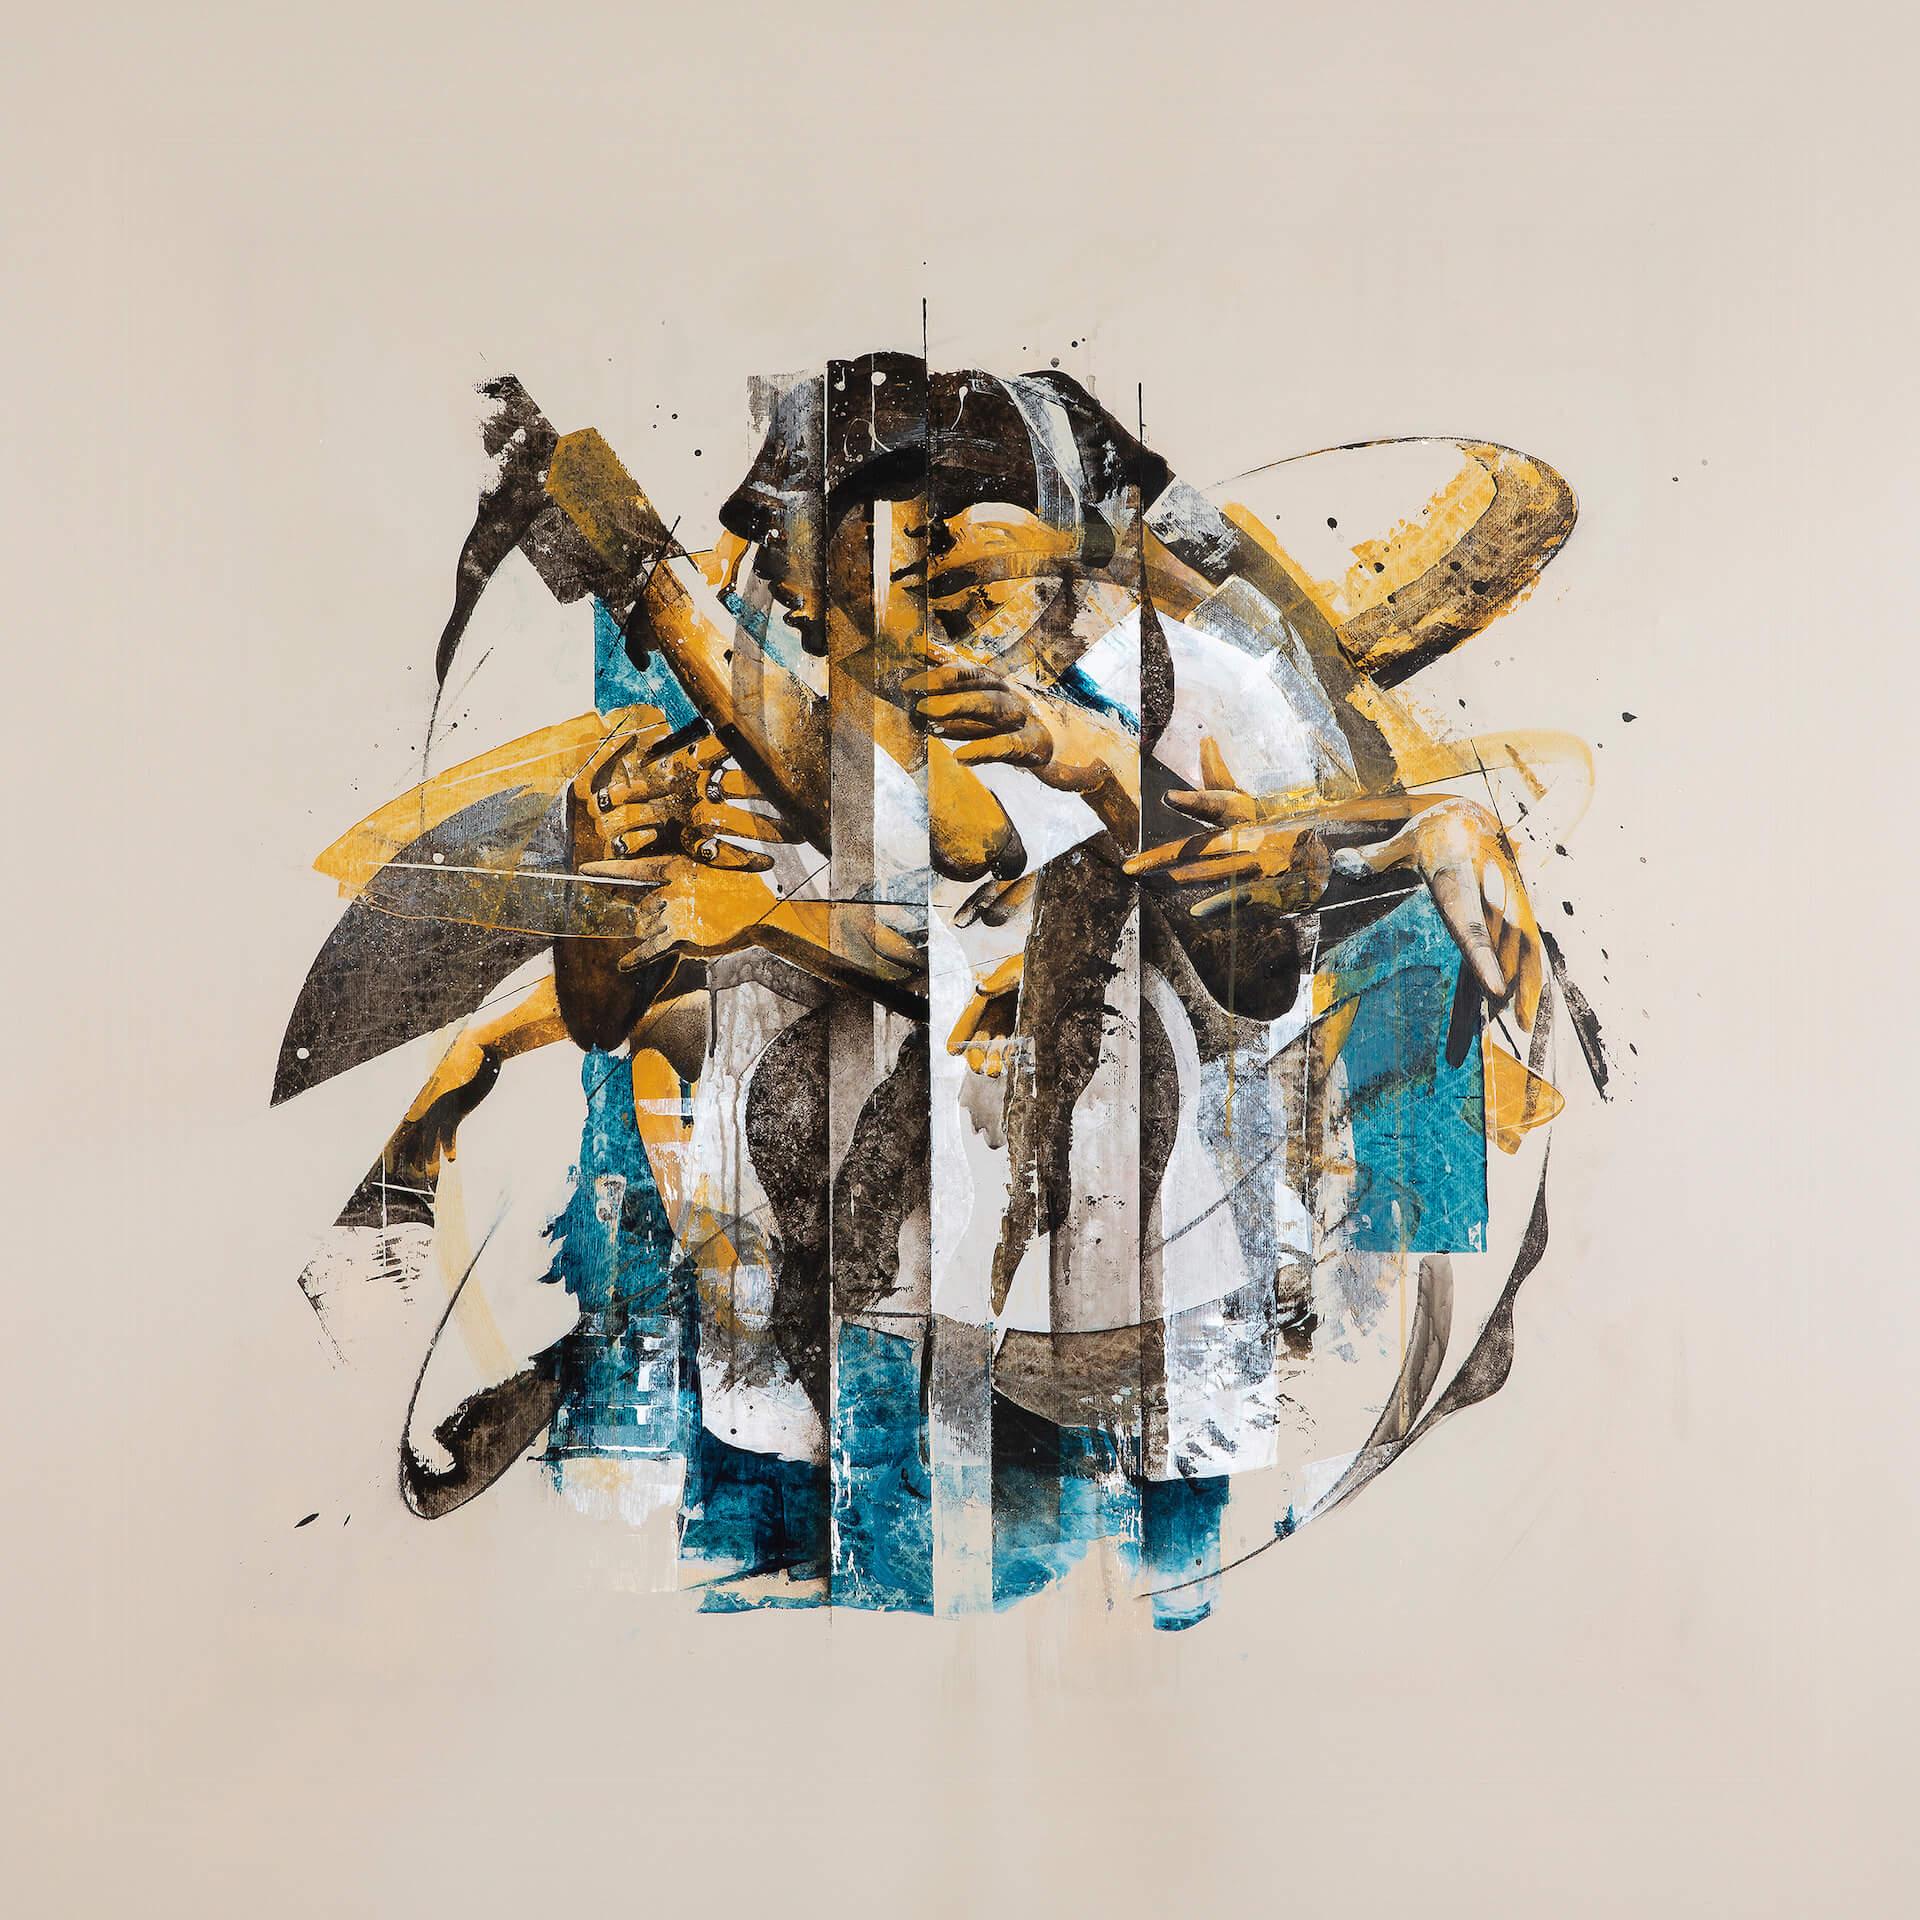 Campanellaのニューアルバム『AMULUE』がリリース決定 Ramza、ERA、鎮座DOPENESS、JJJ、中納良恵ら参加 music201202_campanella_6